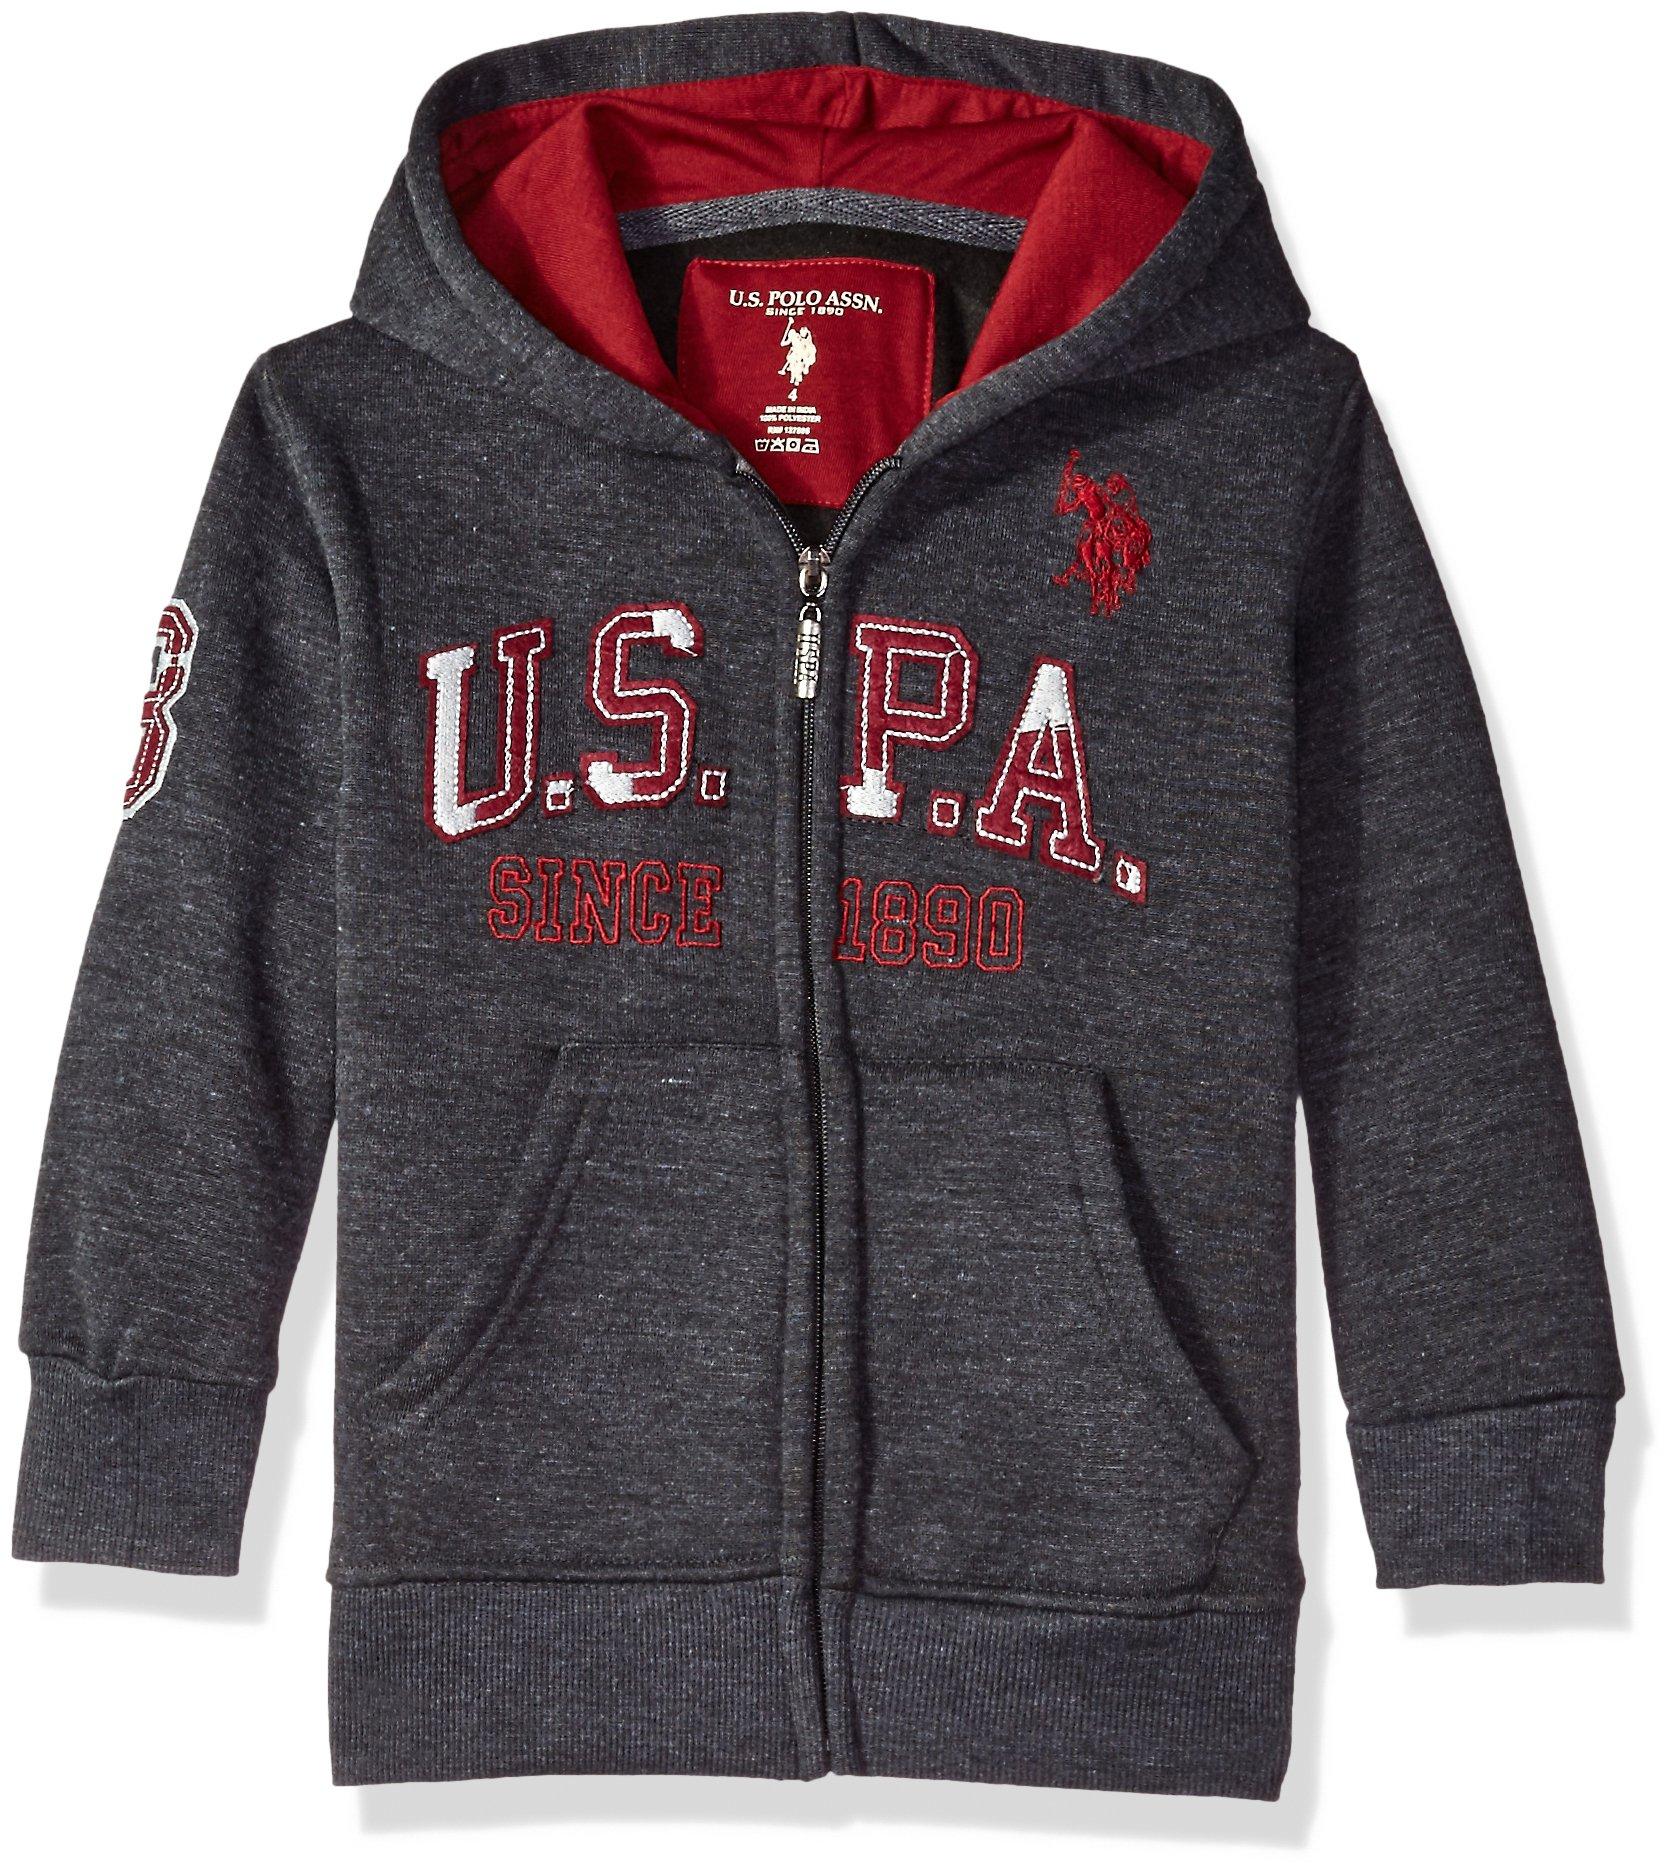 U.S. Polo Assn. Boys' Hooded Zip or Snap Fleece Jacket, All All Star Dark Heather Gray 5/6